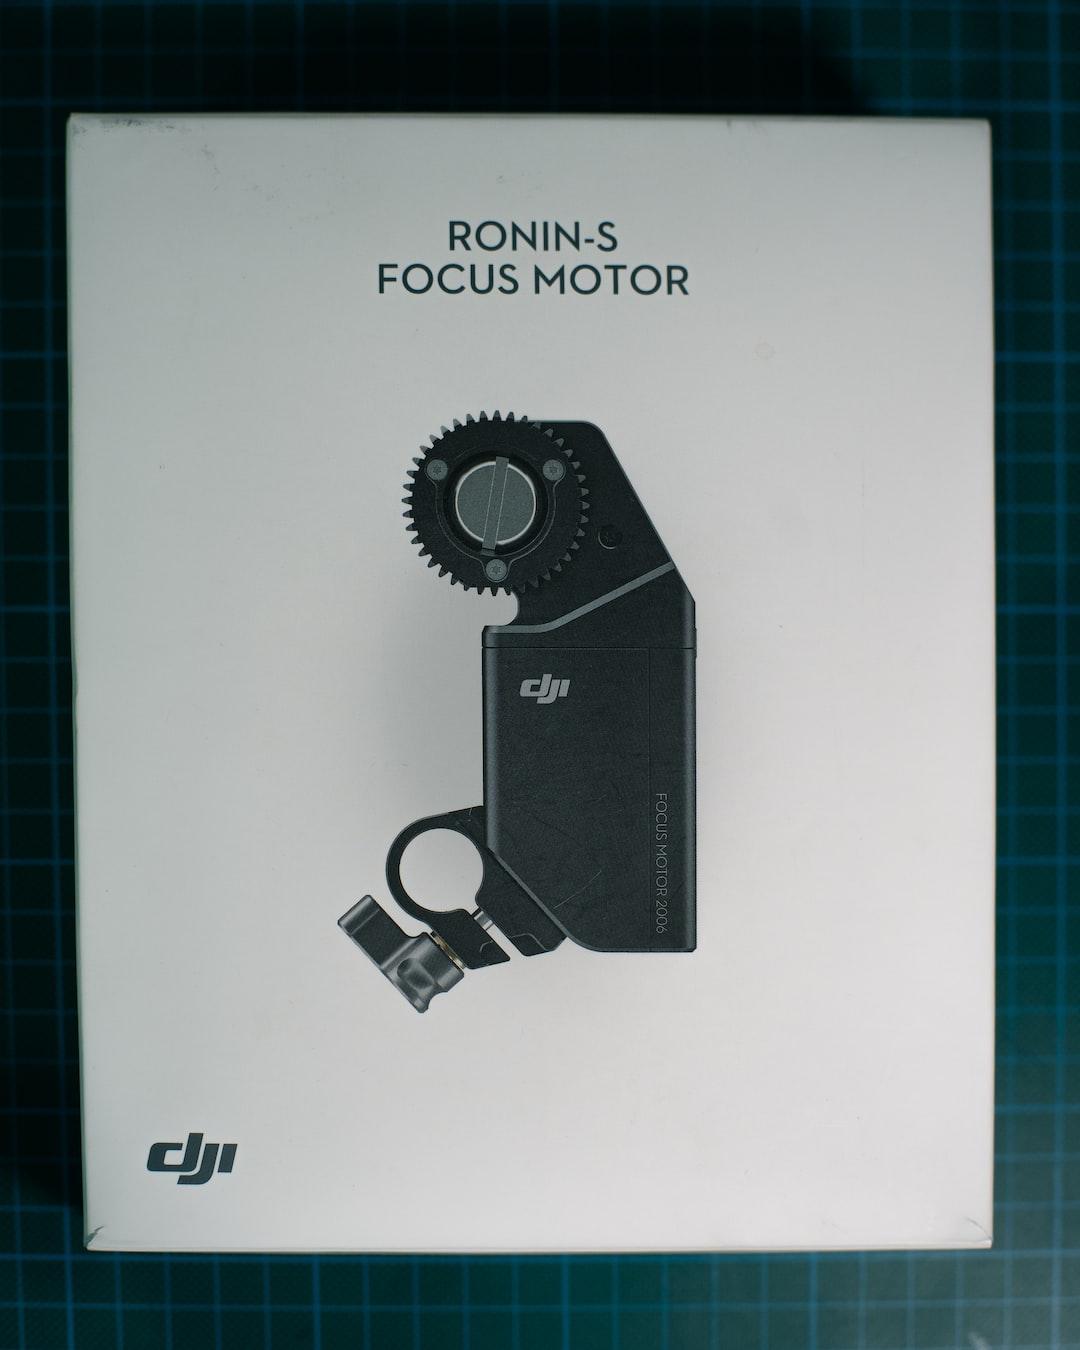 Ronin S focus motor for sale